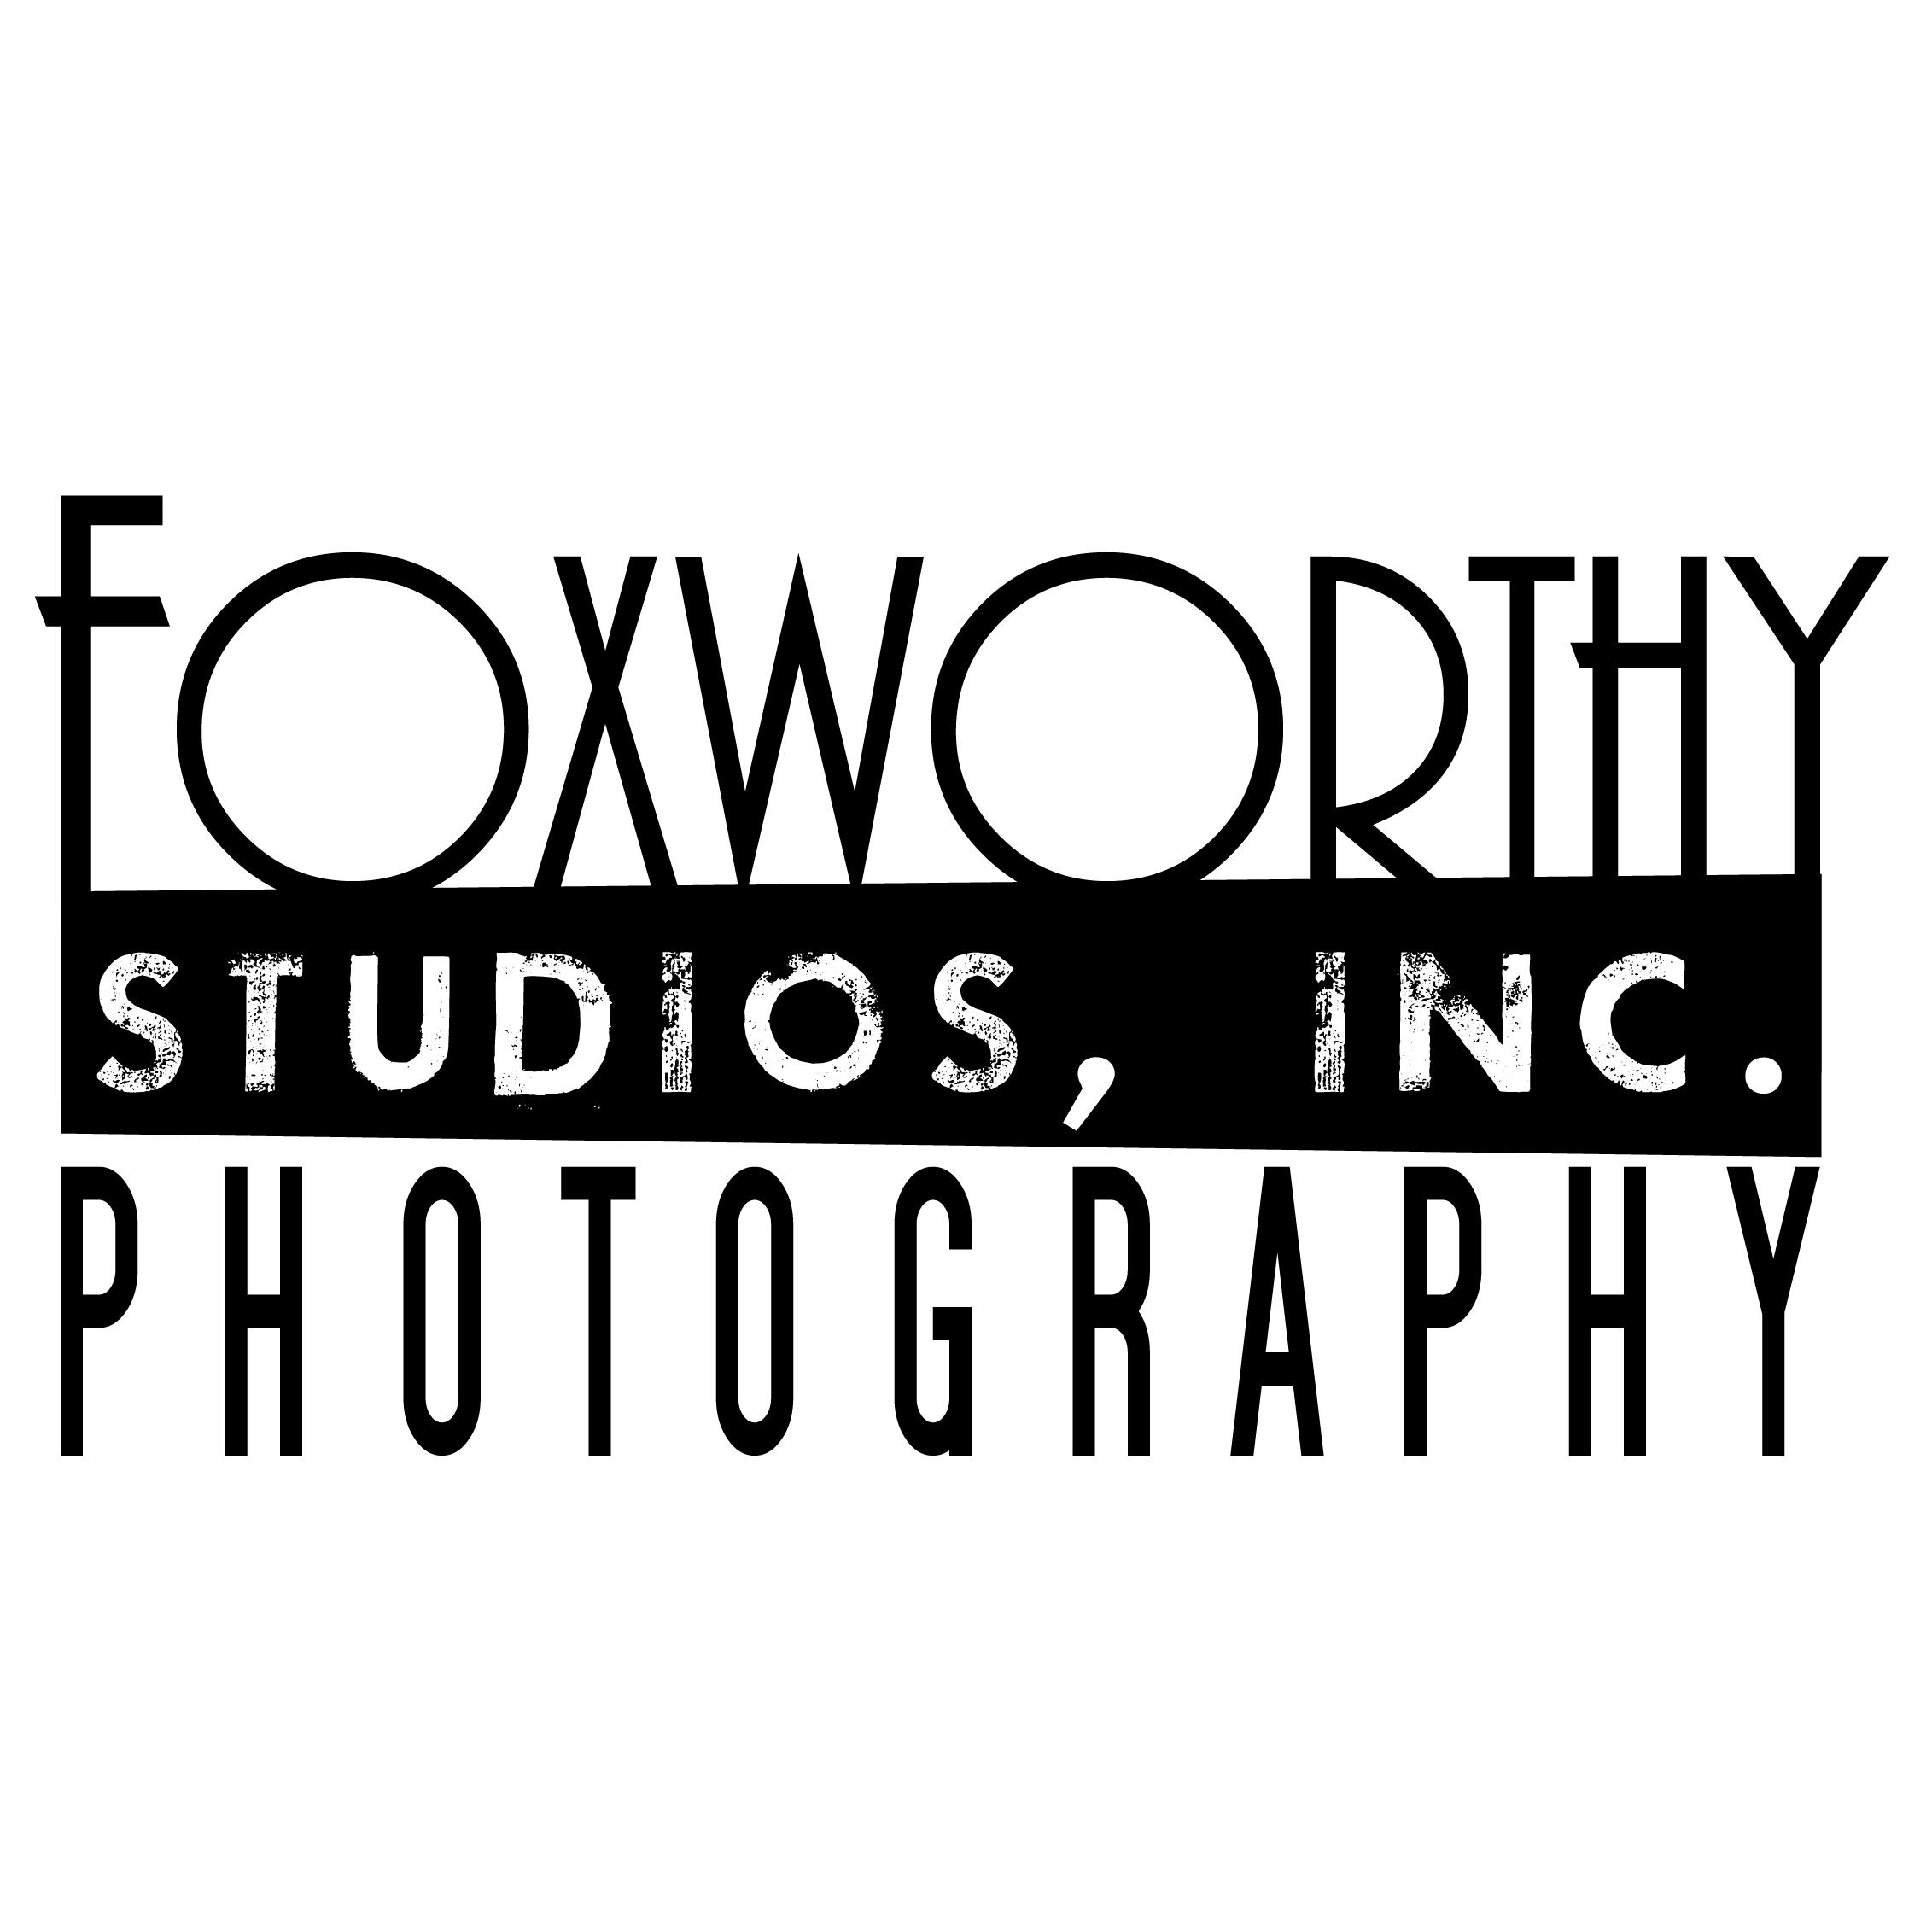 Foxworthy Studios